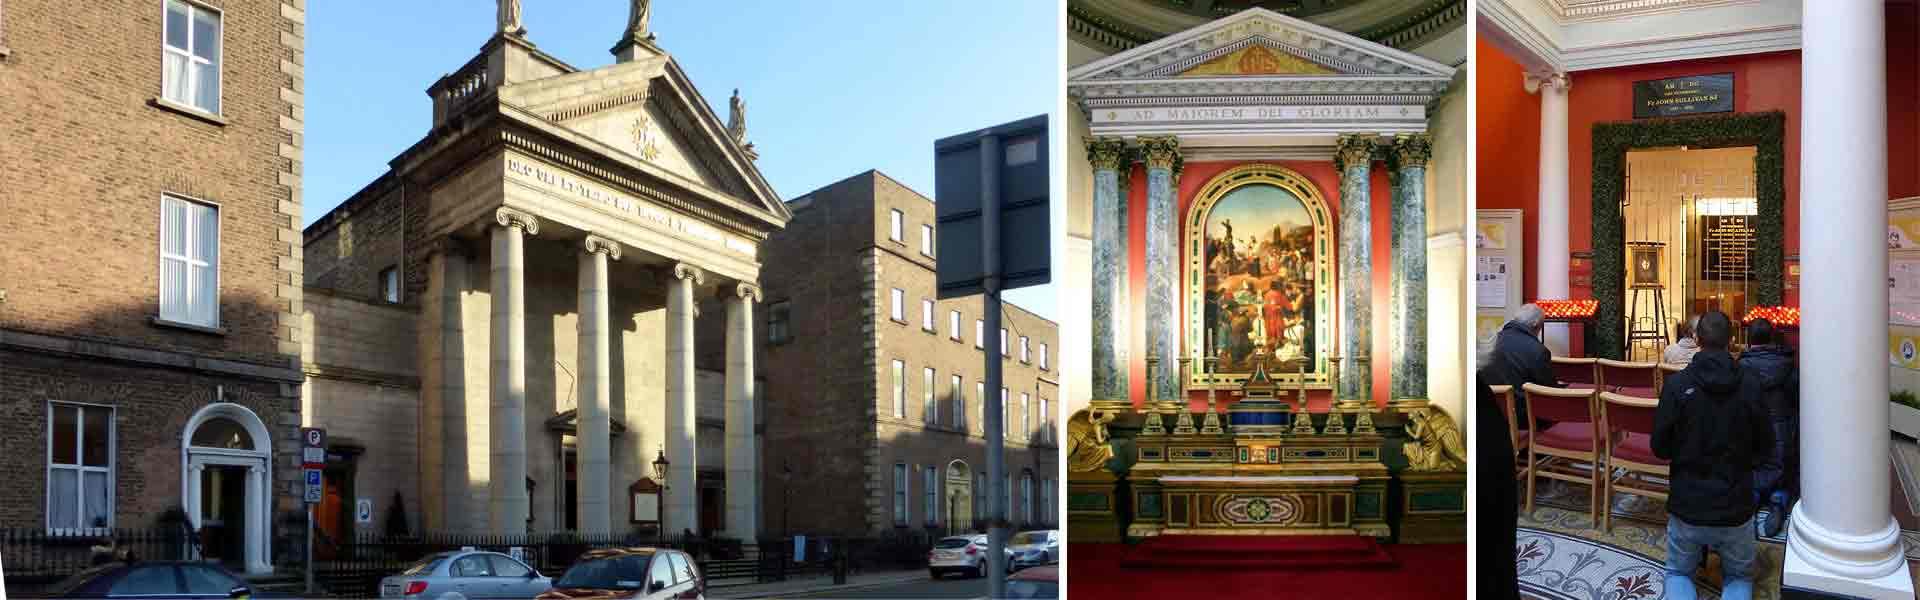 Gardiner Street Parish